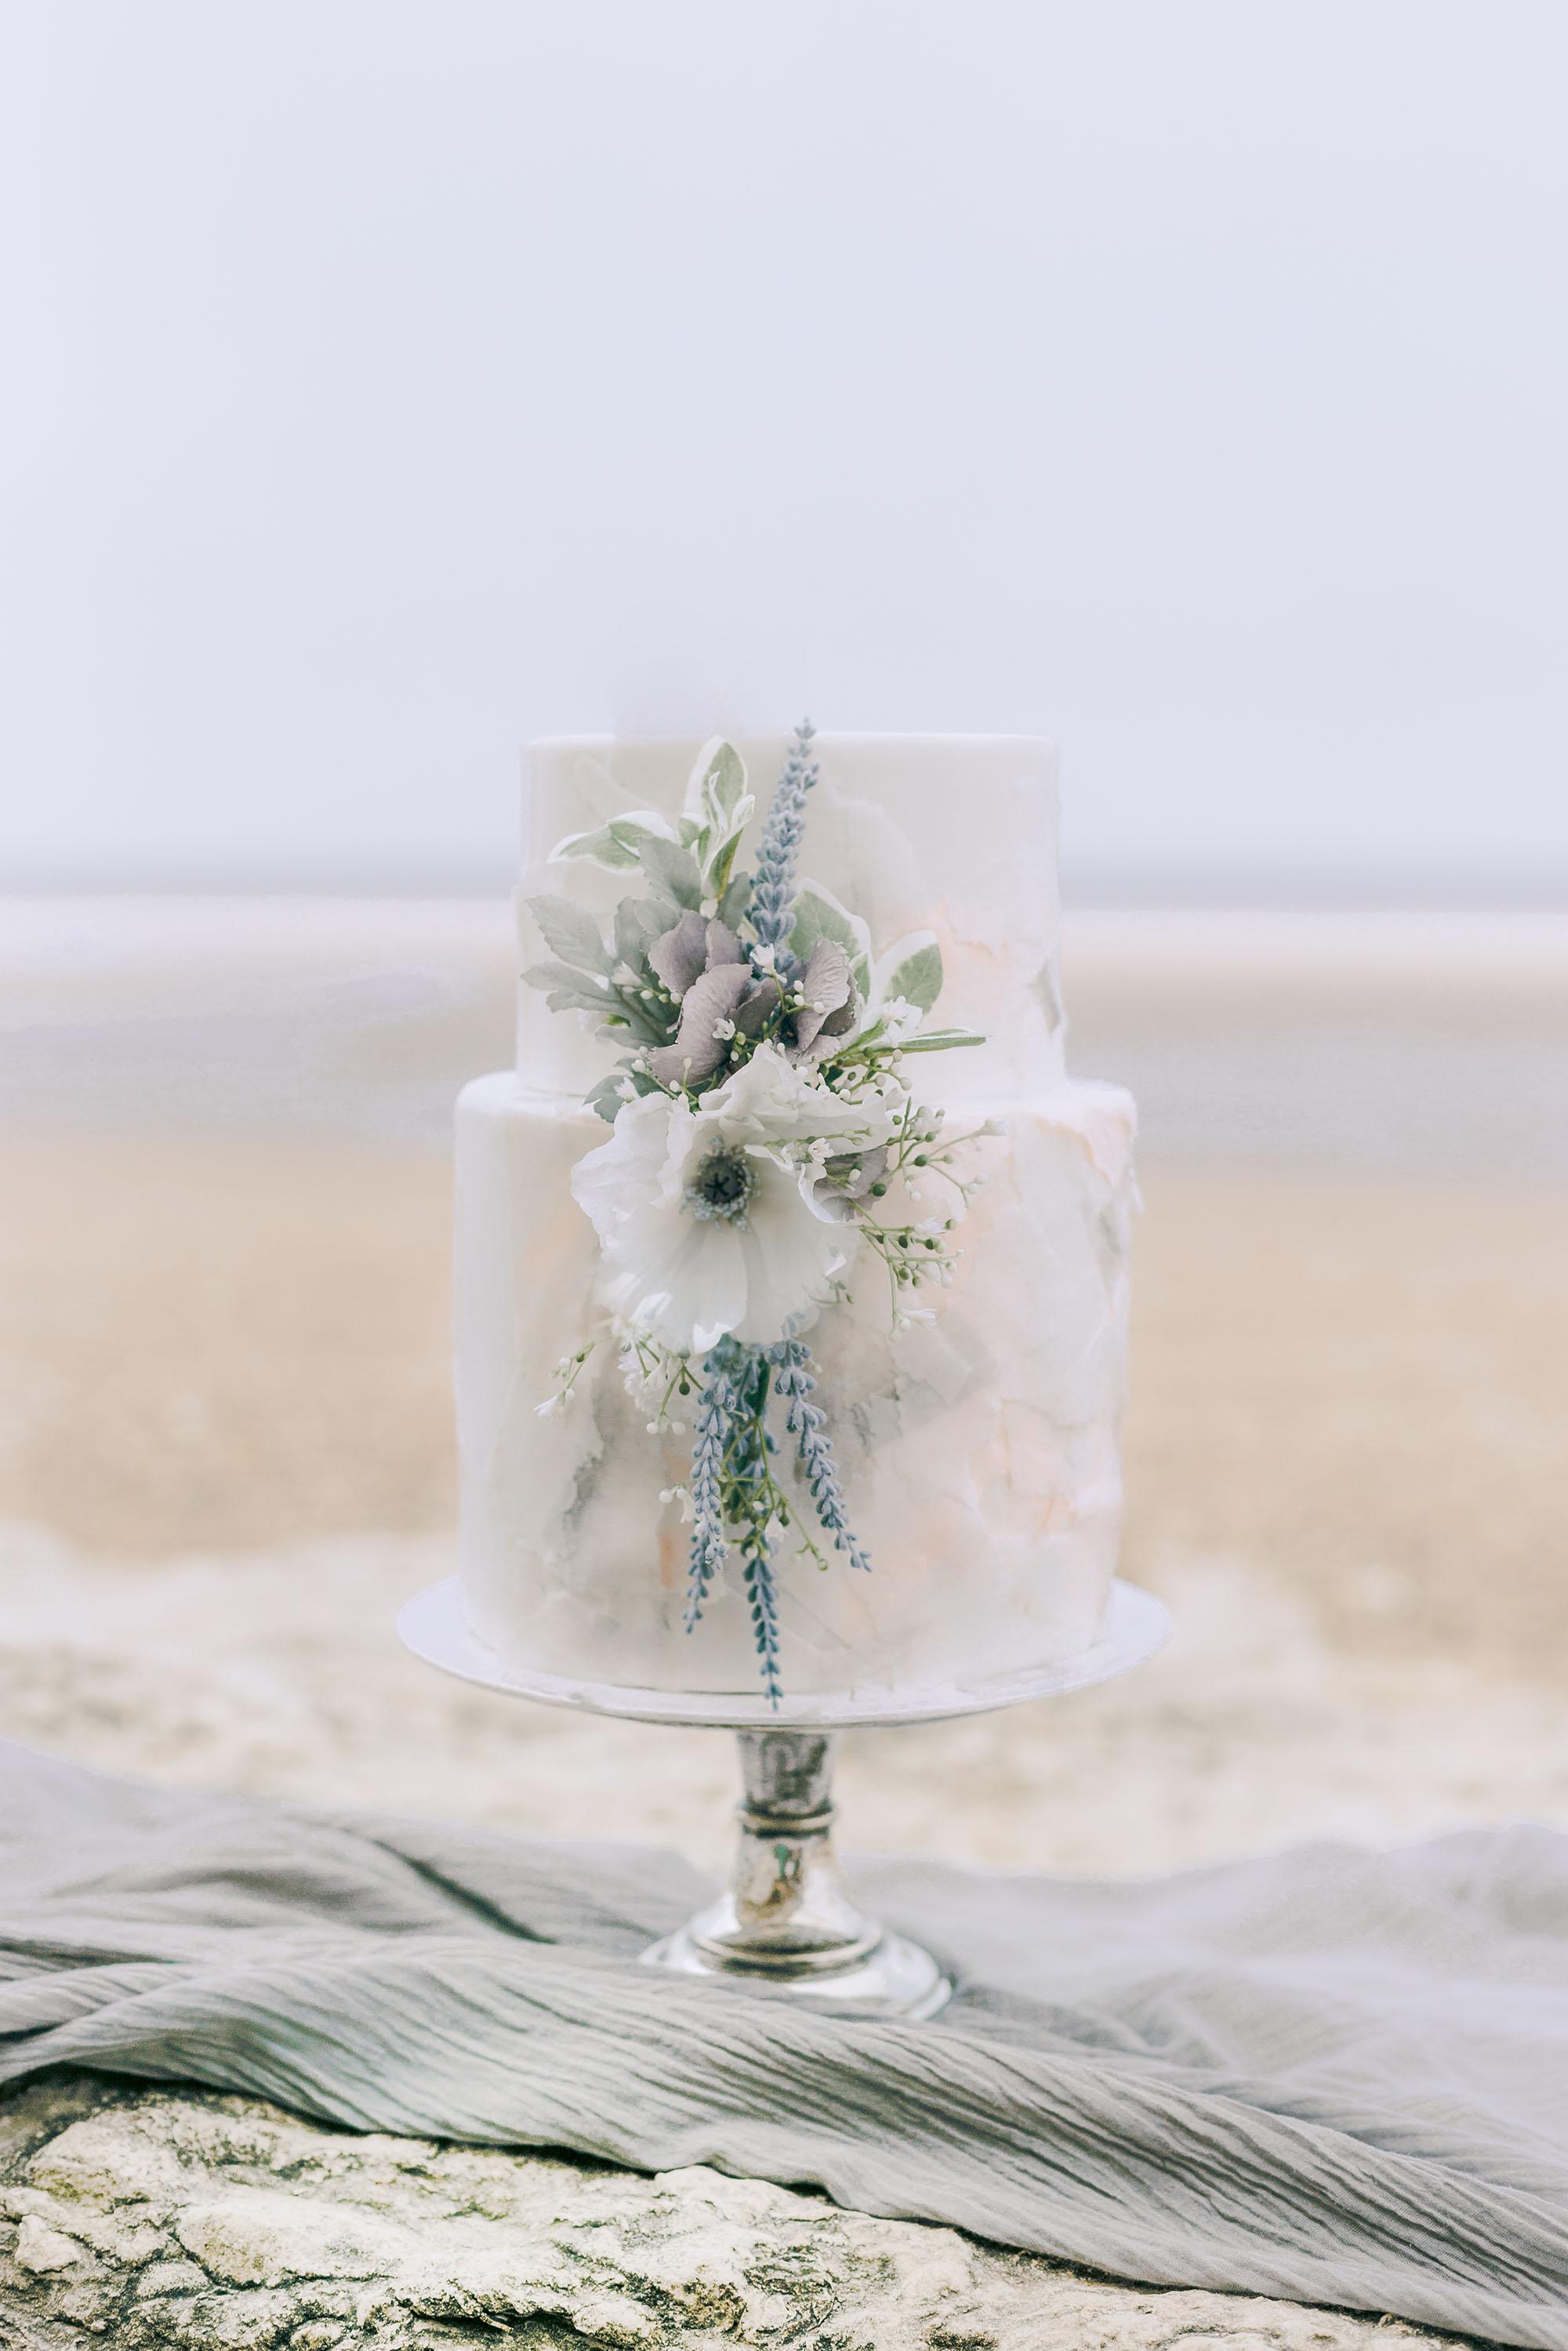 Ethereal Beach Styled Shoot Wedding Cake